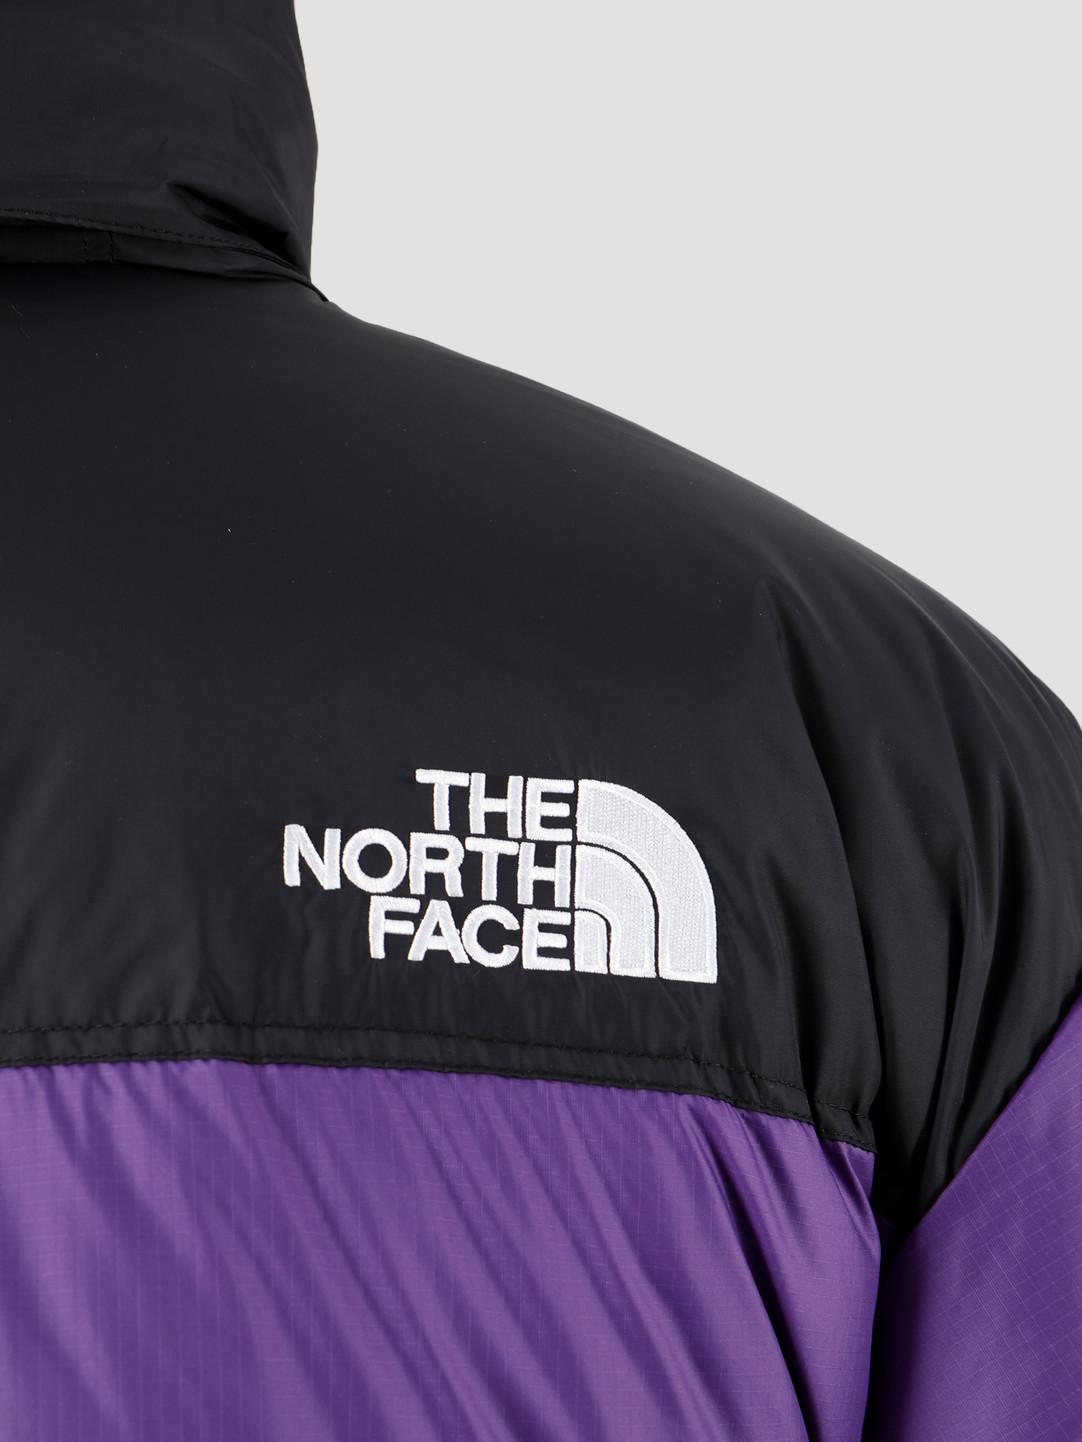 The North Face The North Face 1996 Retro Nuptse Jacket Hero Purple T93C8DN5N